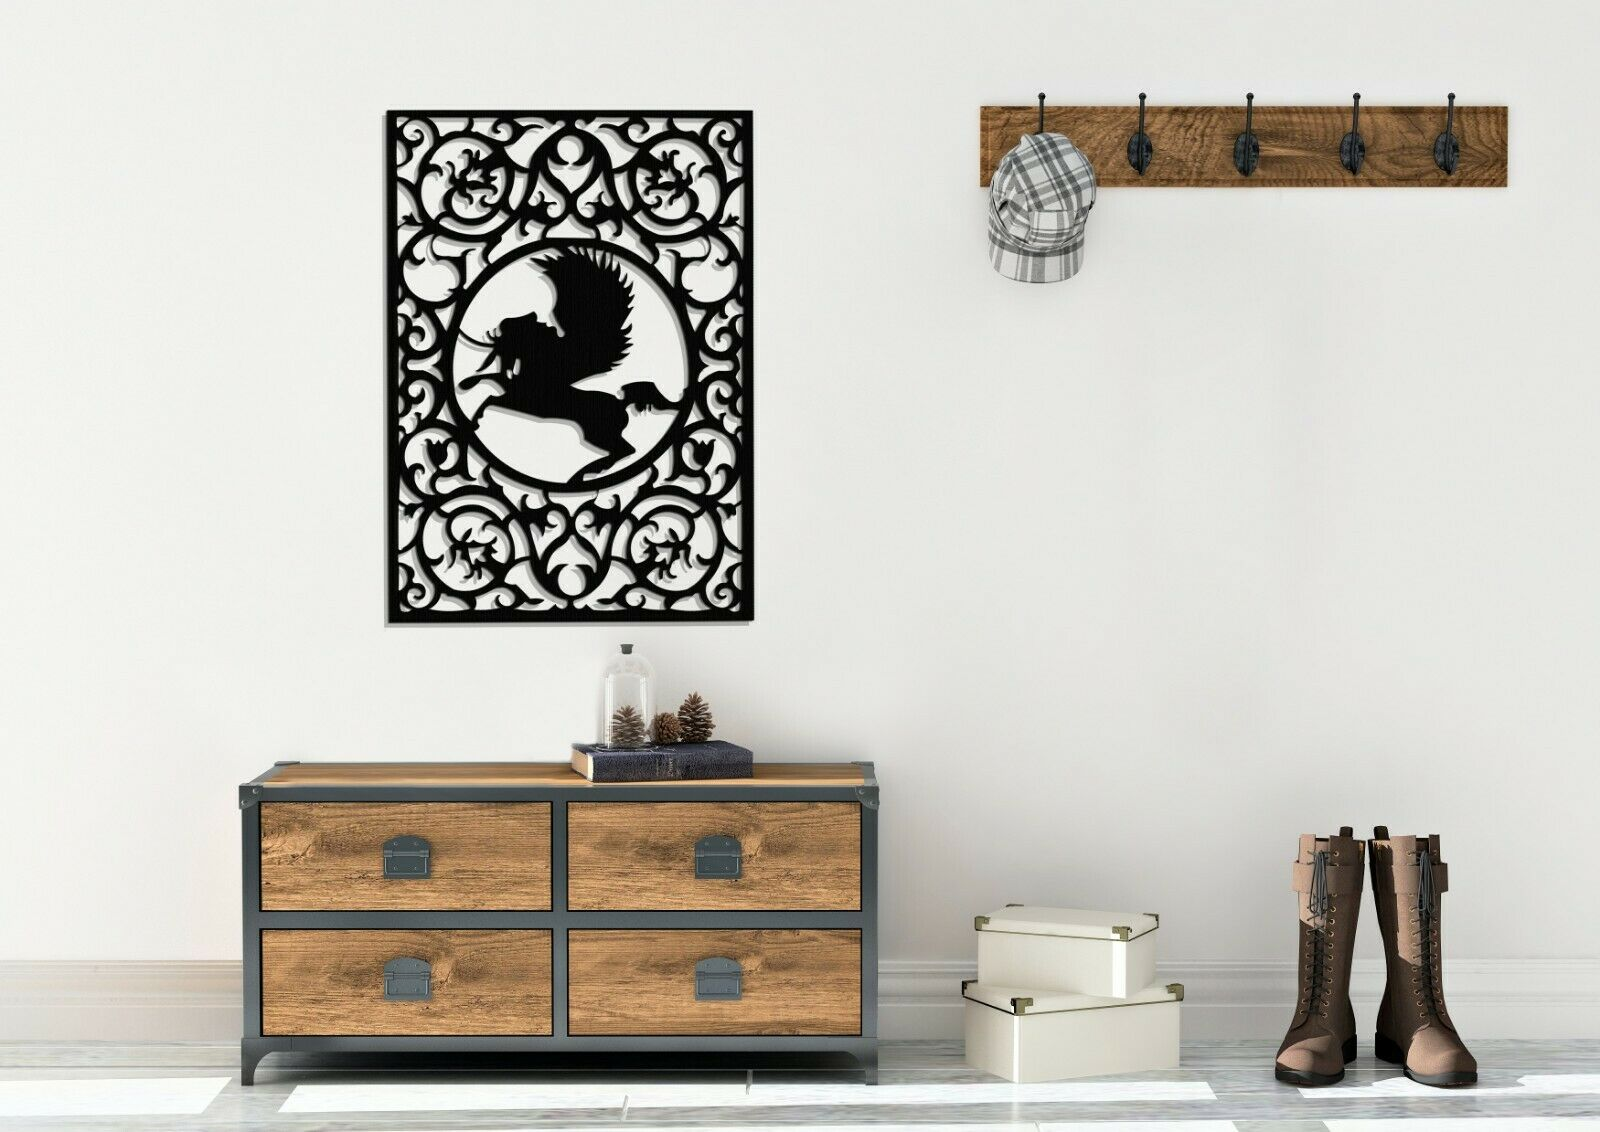 3D DEKORATIVE WANDPANEEL, PEGASUS, MYTHOLOGIE,52 x 73 cm, WANDDEKOR, HANDMADE | Online Shop